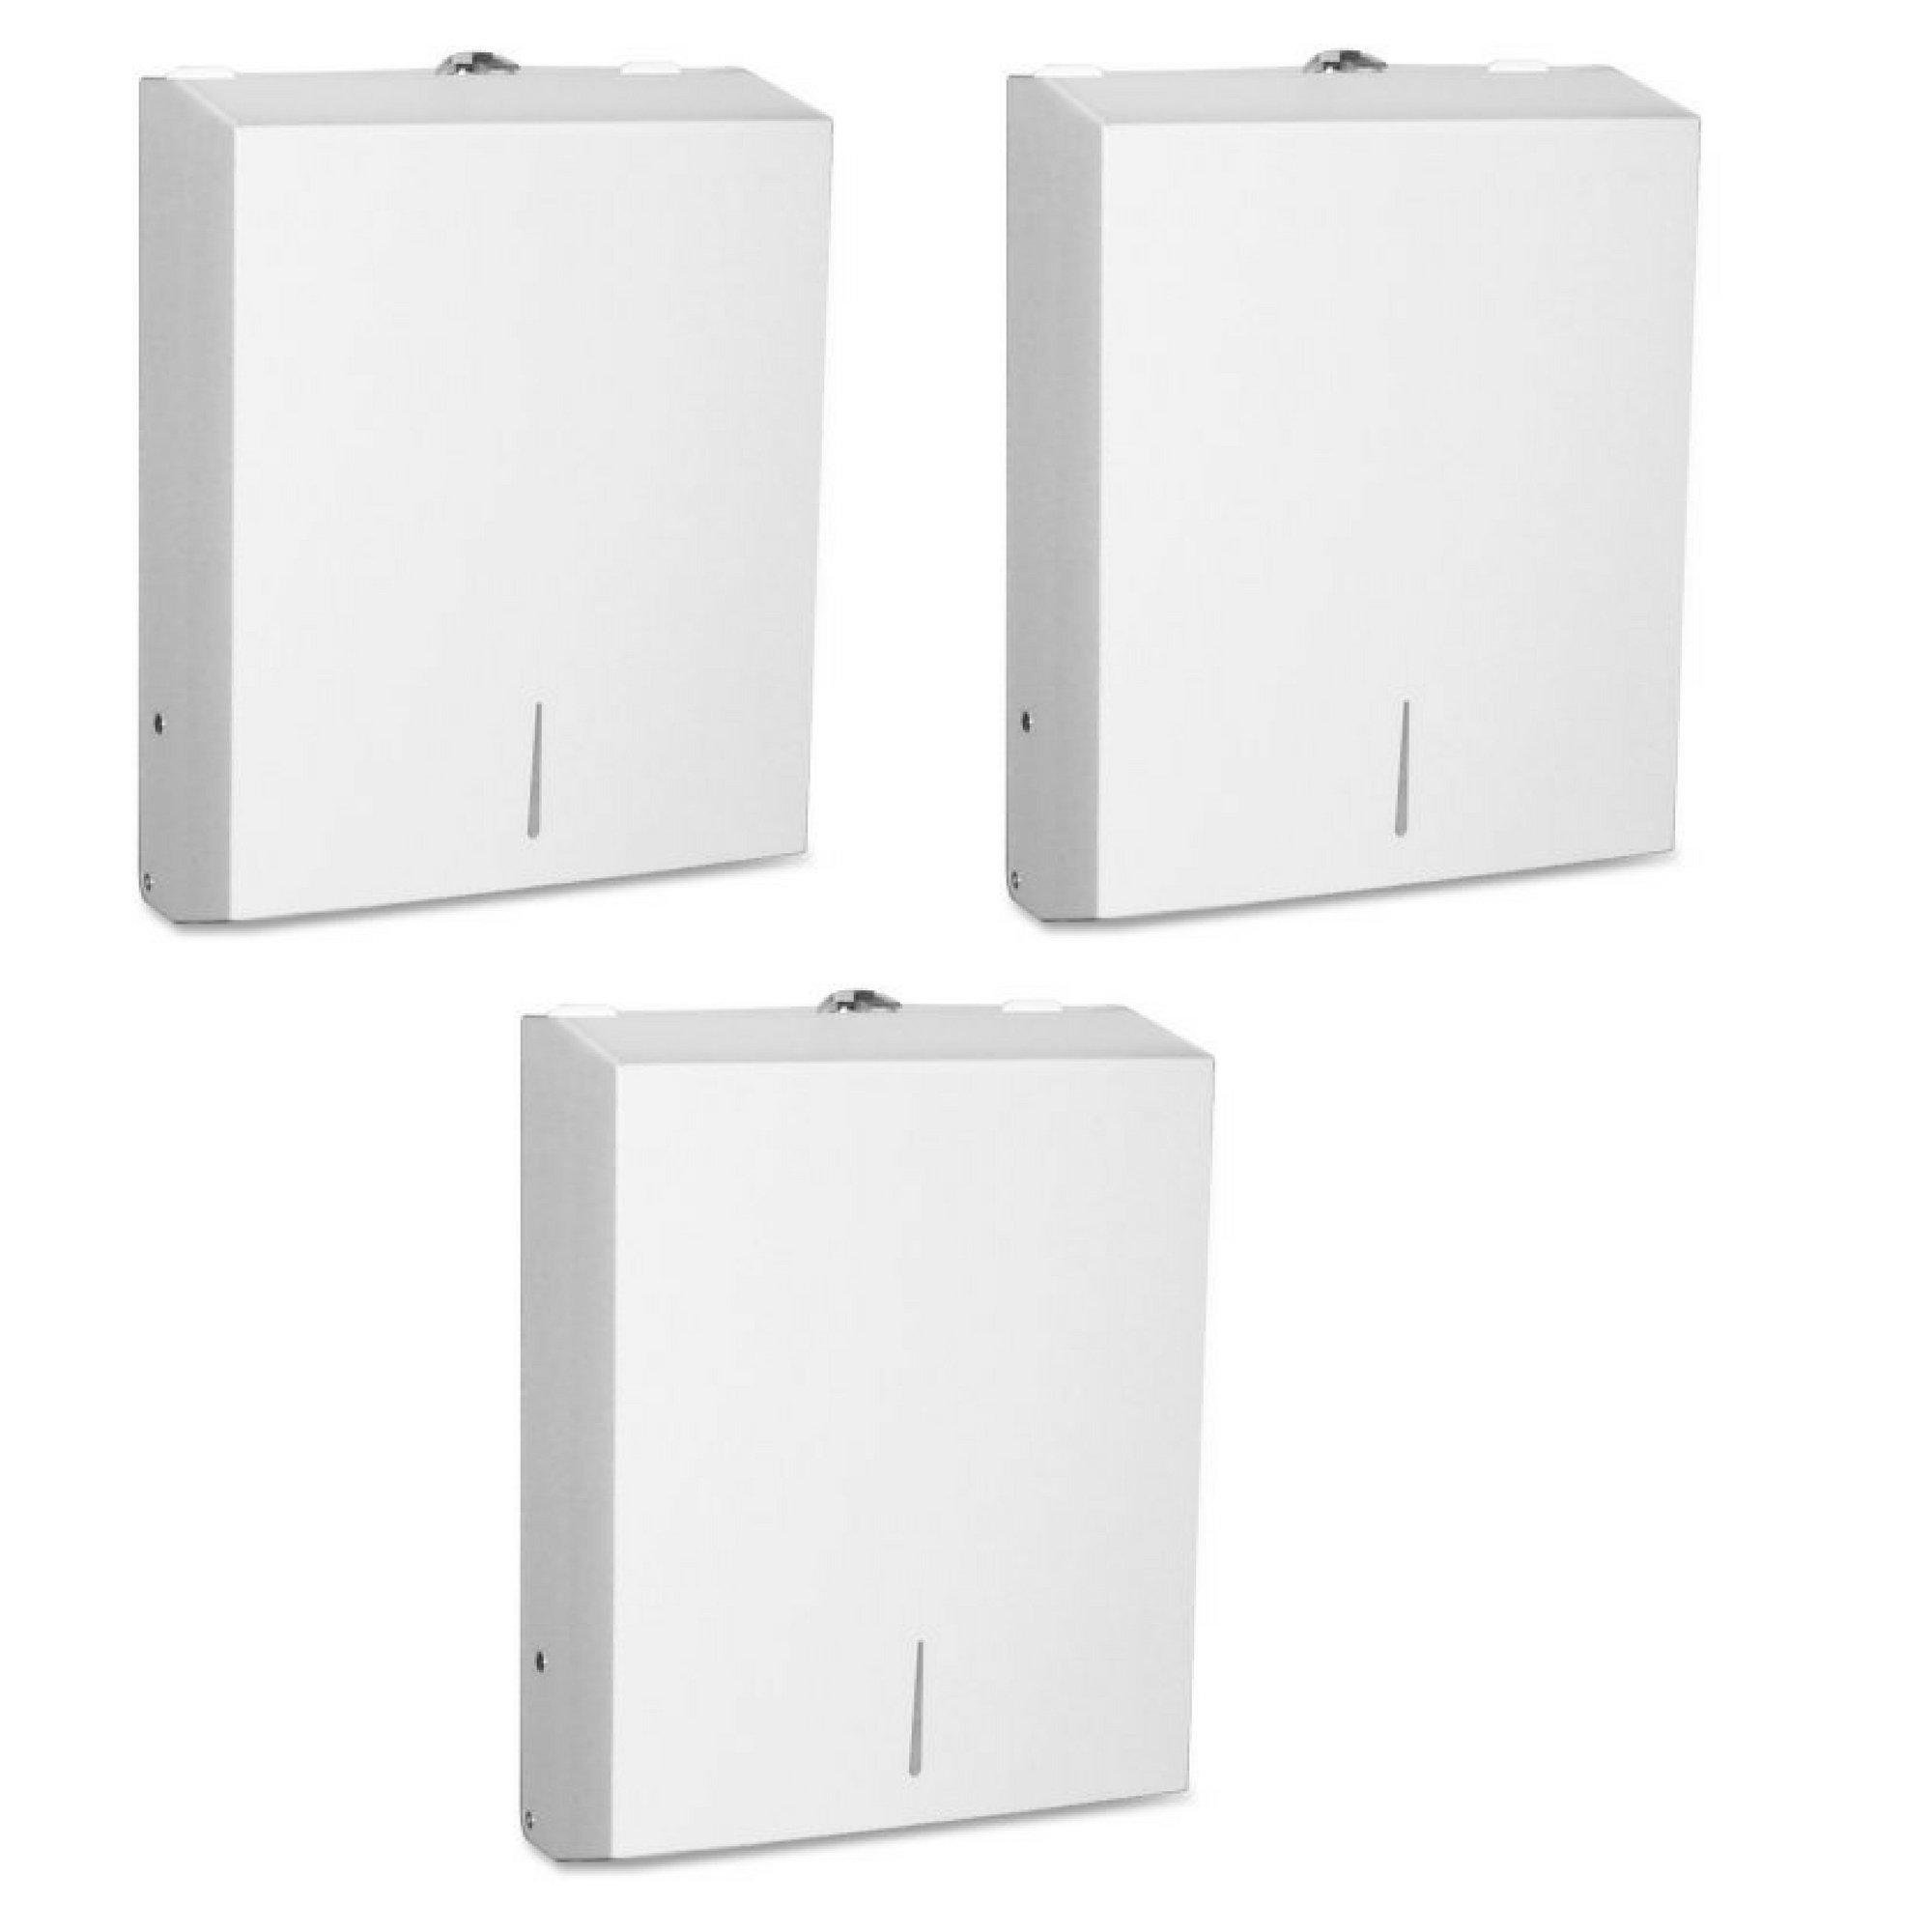 Genuine Joe C-Fold/Multi-fold Towel Disp. Cabinet - 3 Pack